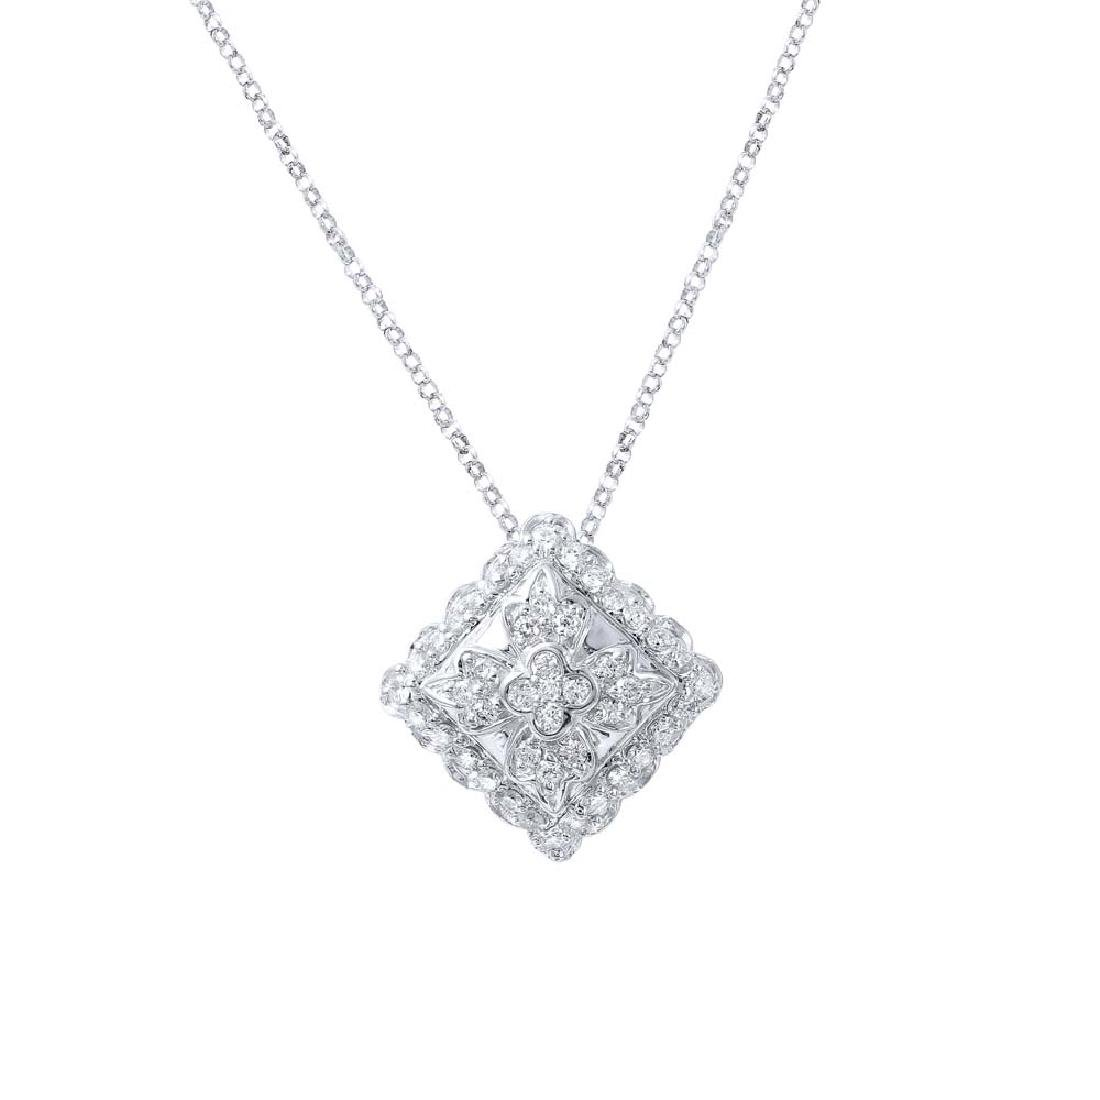 Genuine 0.73 TCW 18K White Gold Ladies Necklace